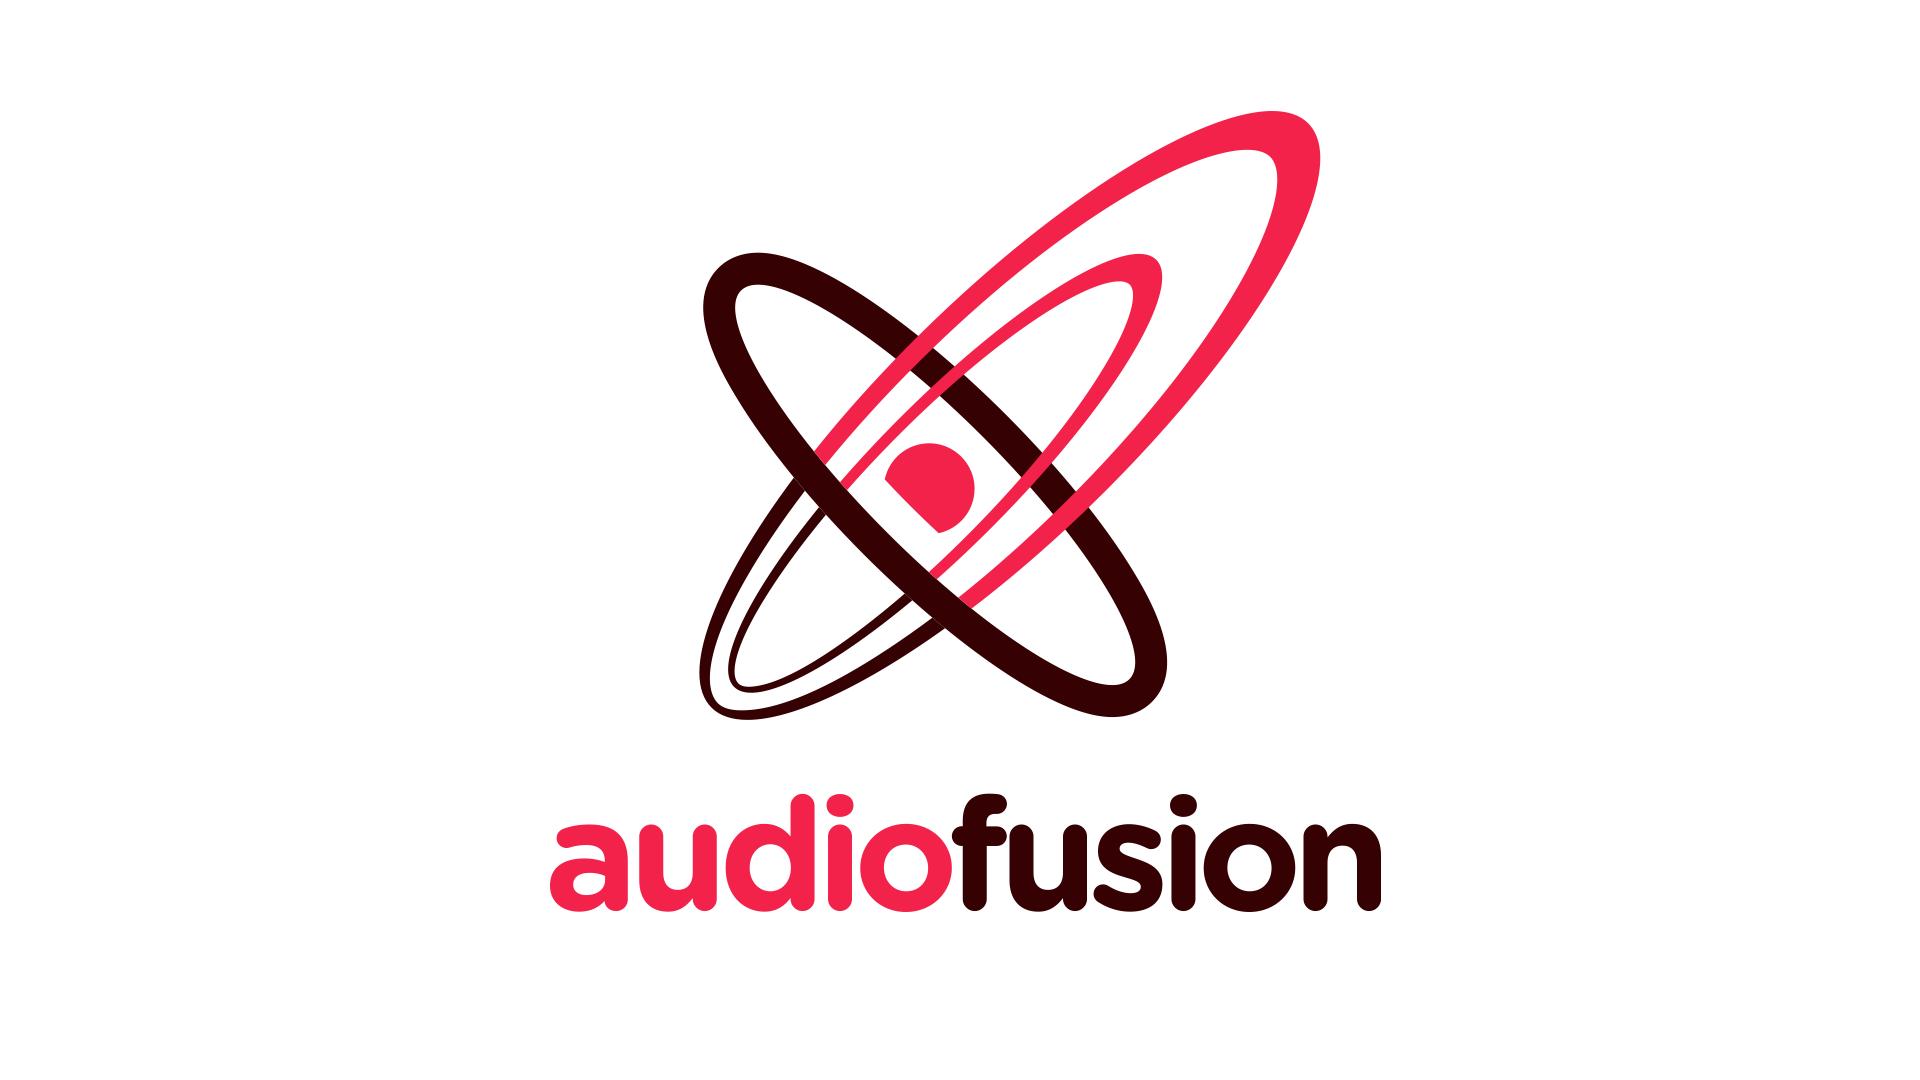 audioFusion_branding_portfolio_.001.png